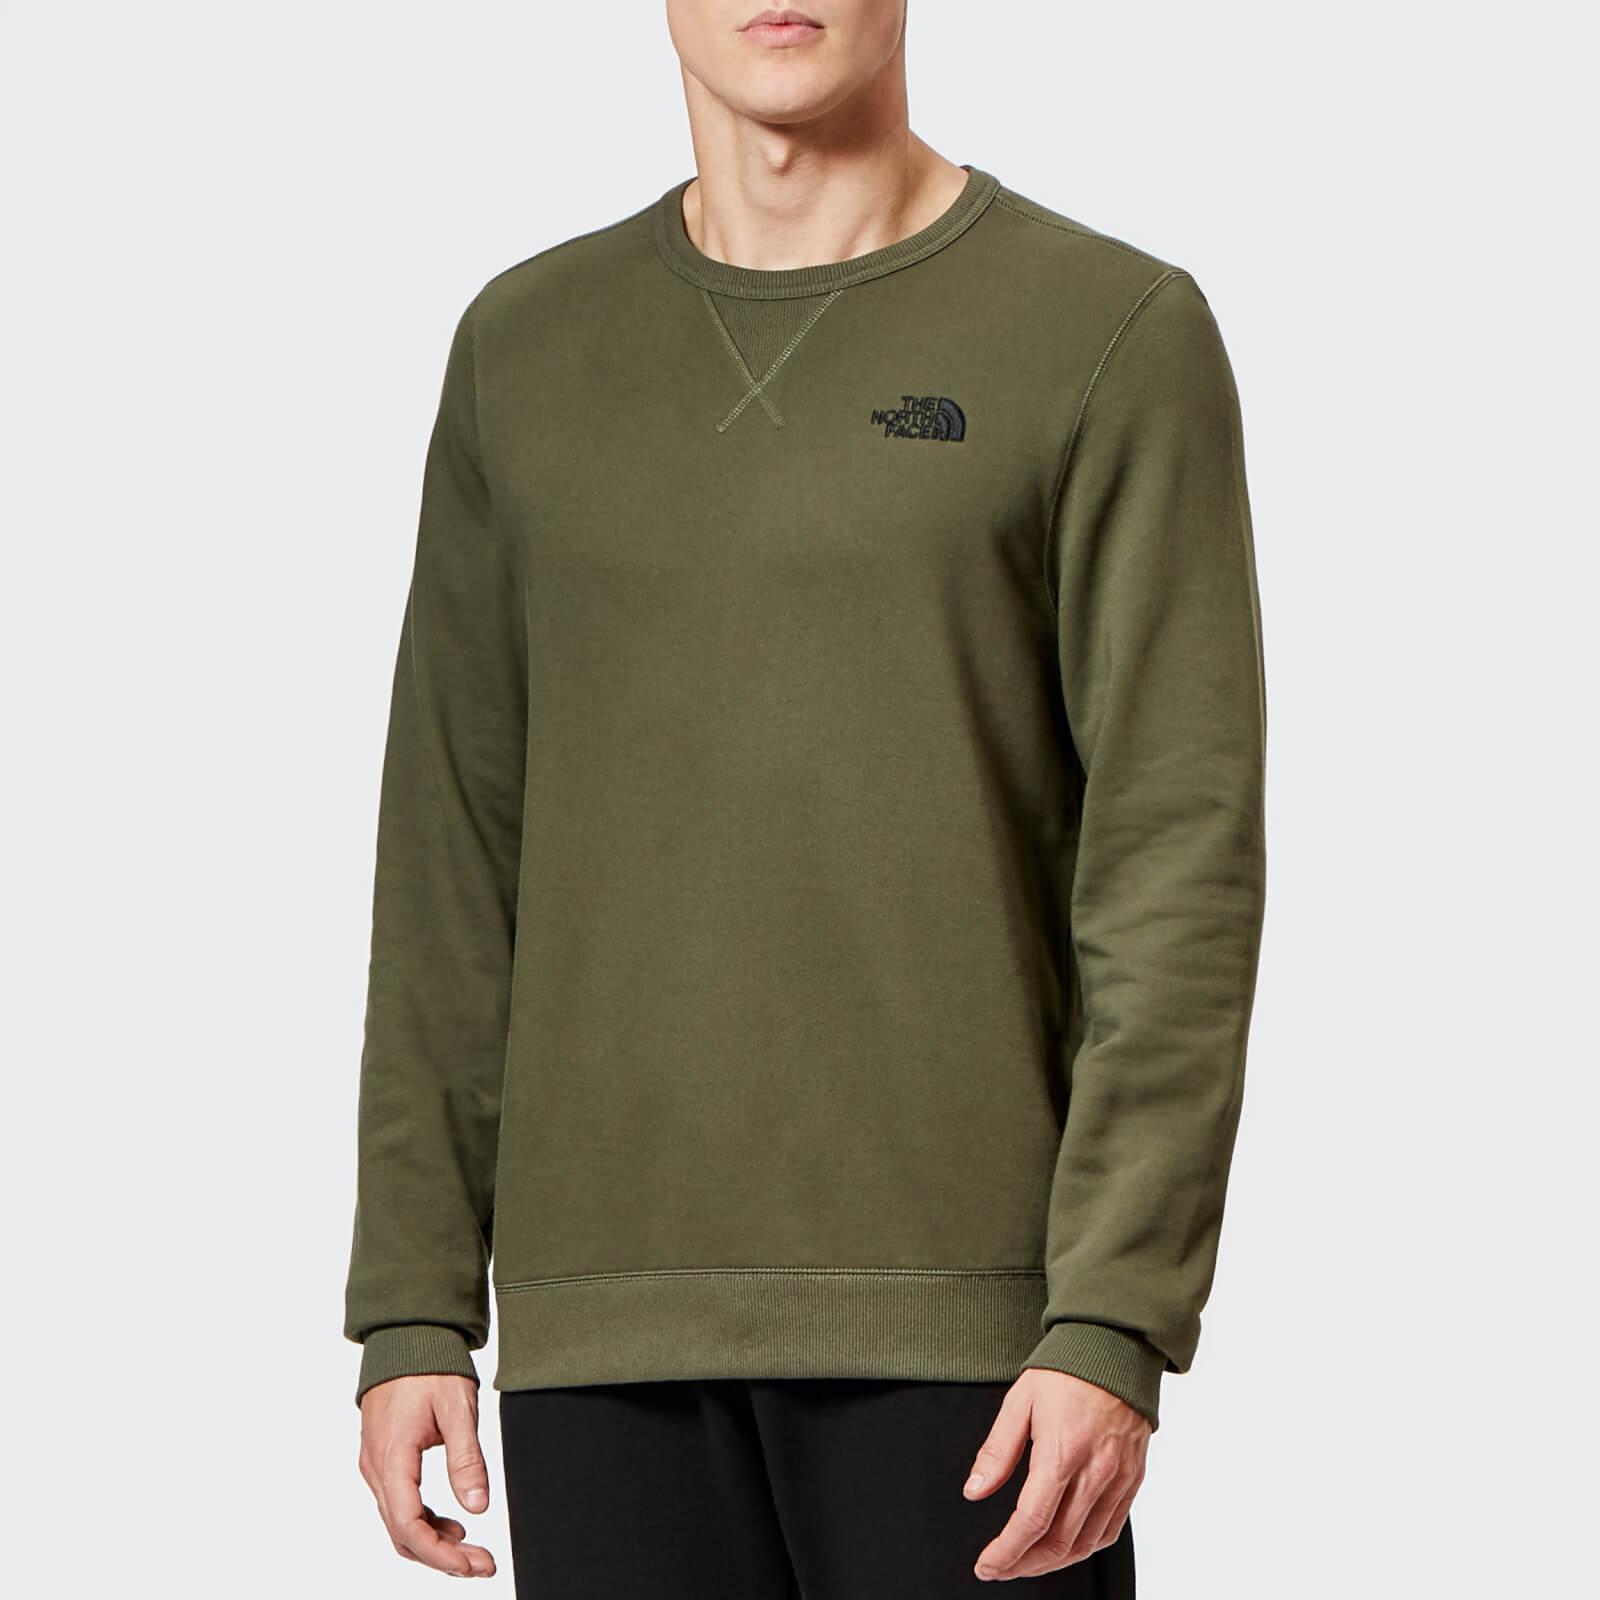 a1d05e0df The North Face Men's Street Fleece Pullover Sweatshirt - New Taupe Green